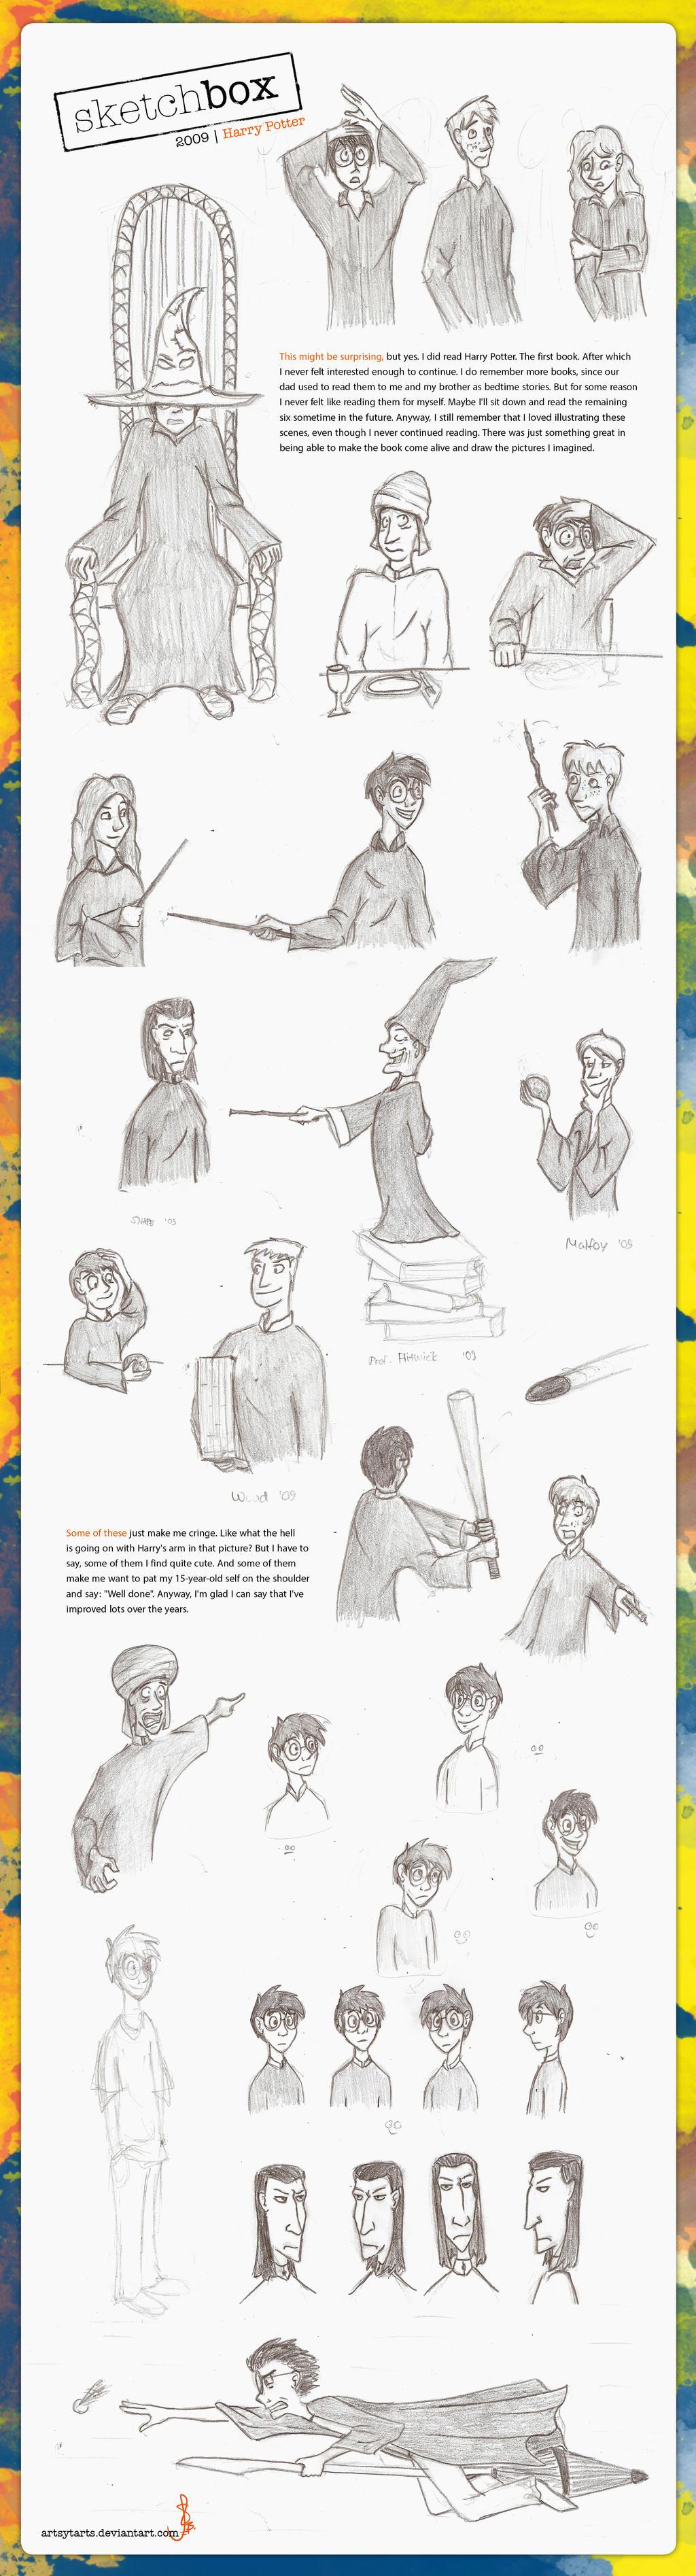 Sketchbox4 2009 Harry Potter by artsytarts